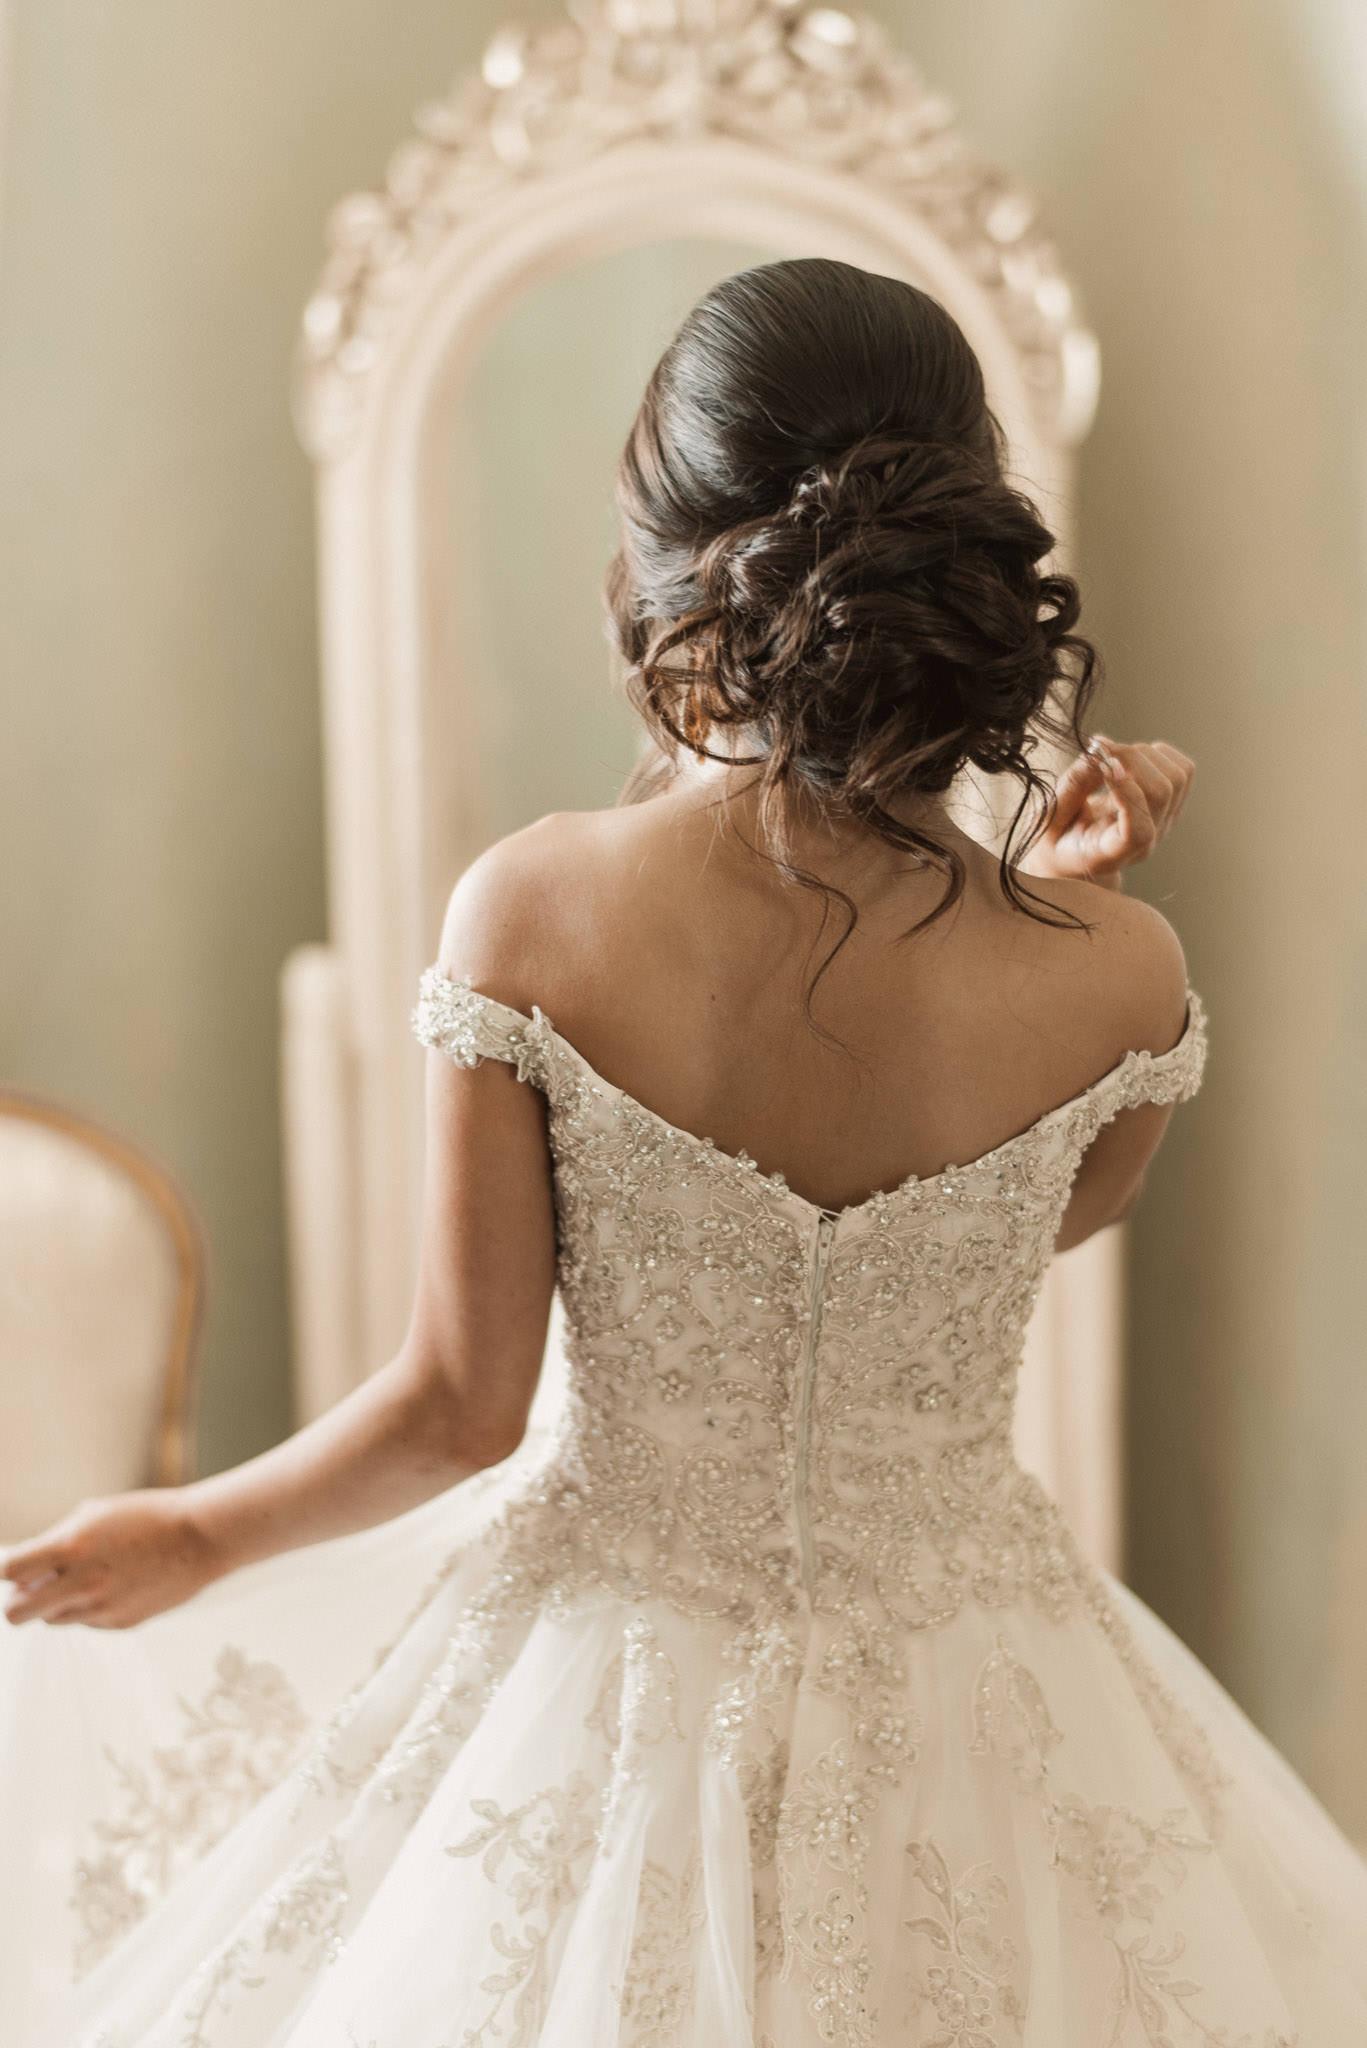 adriana-christian-wedding-re-sm-28.jpg